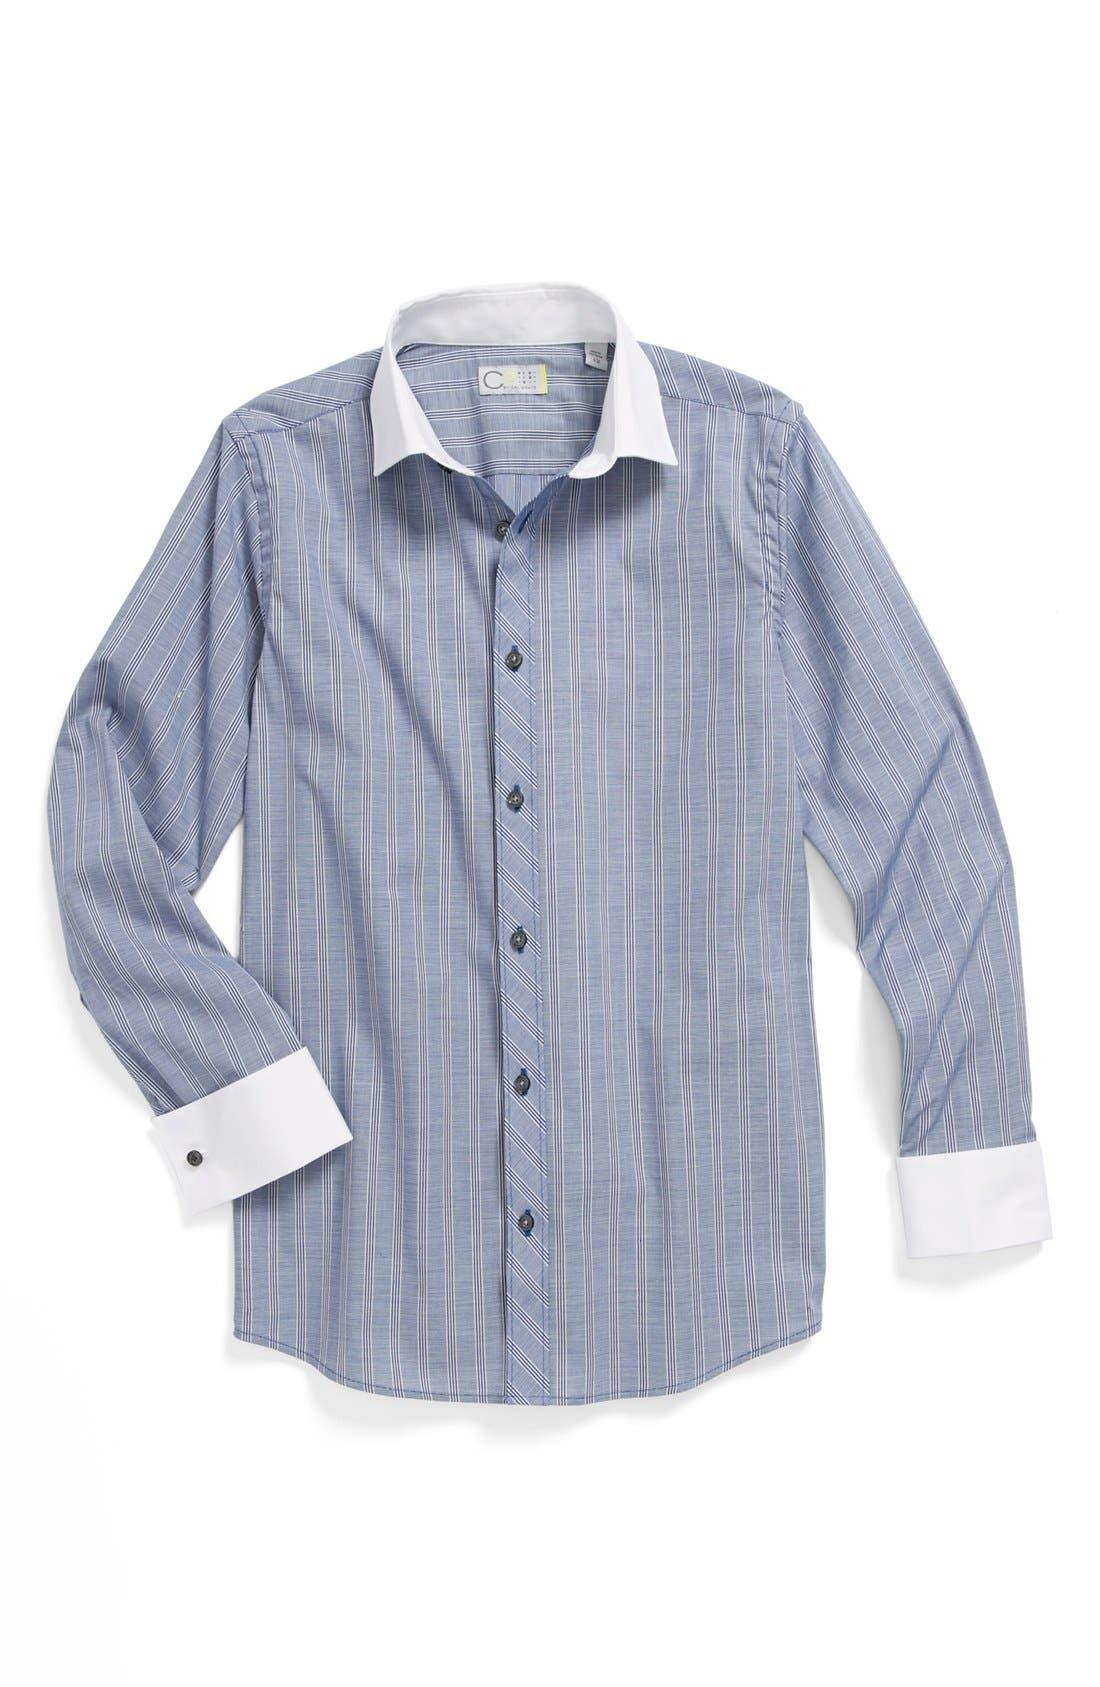 Alternate Image 1 Selected - C2 by Calibrate Stripe Dress Shirt (Big Boys)